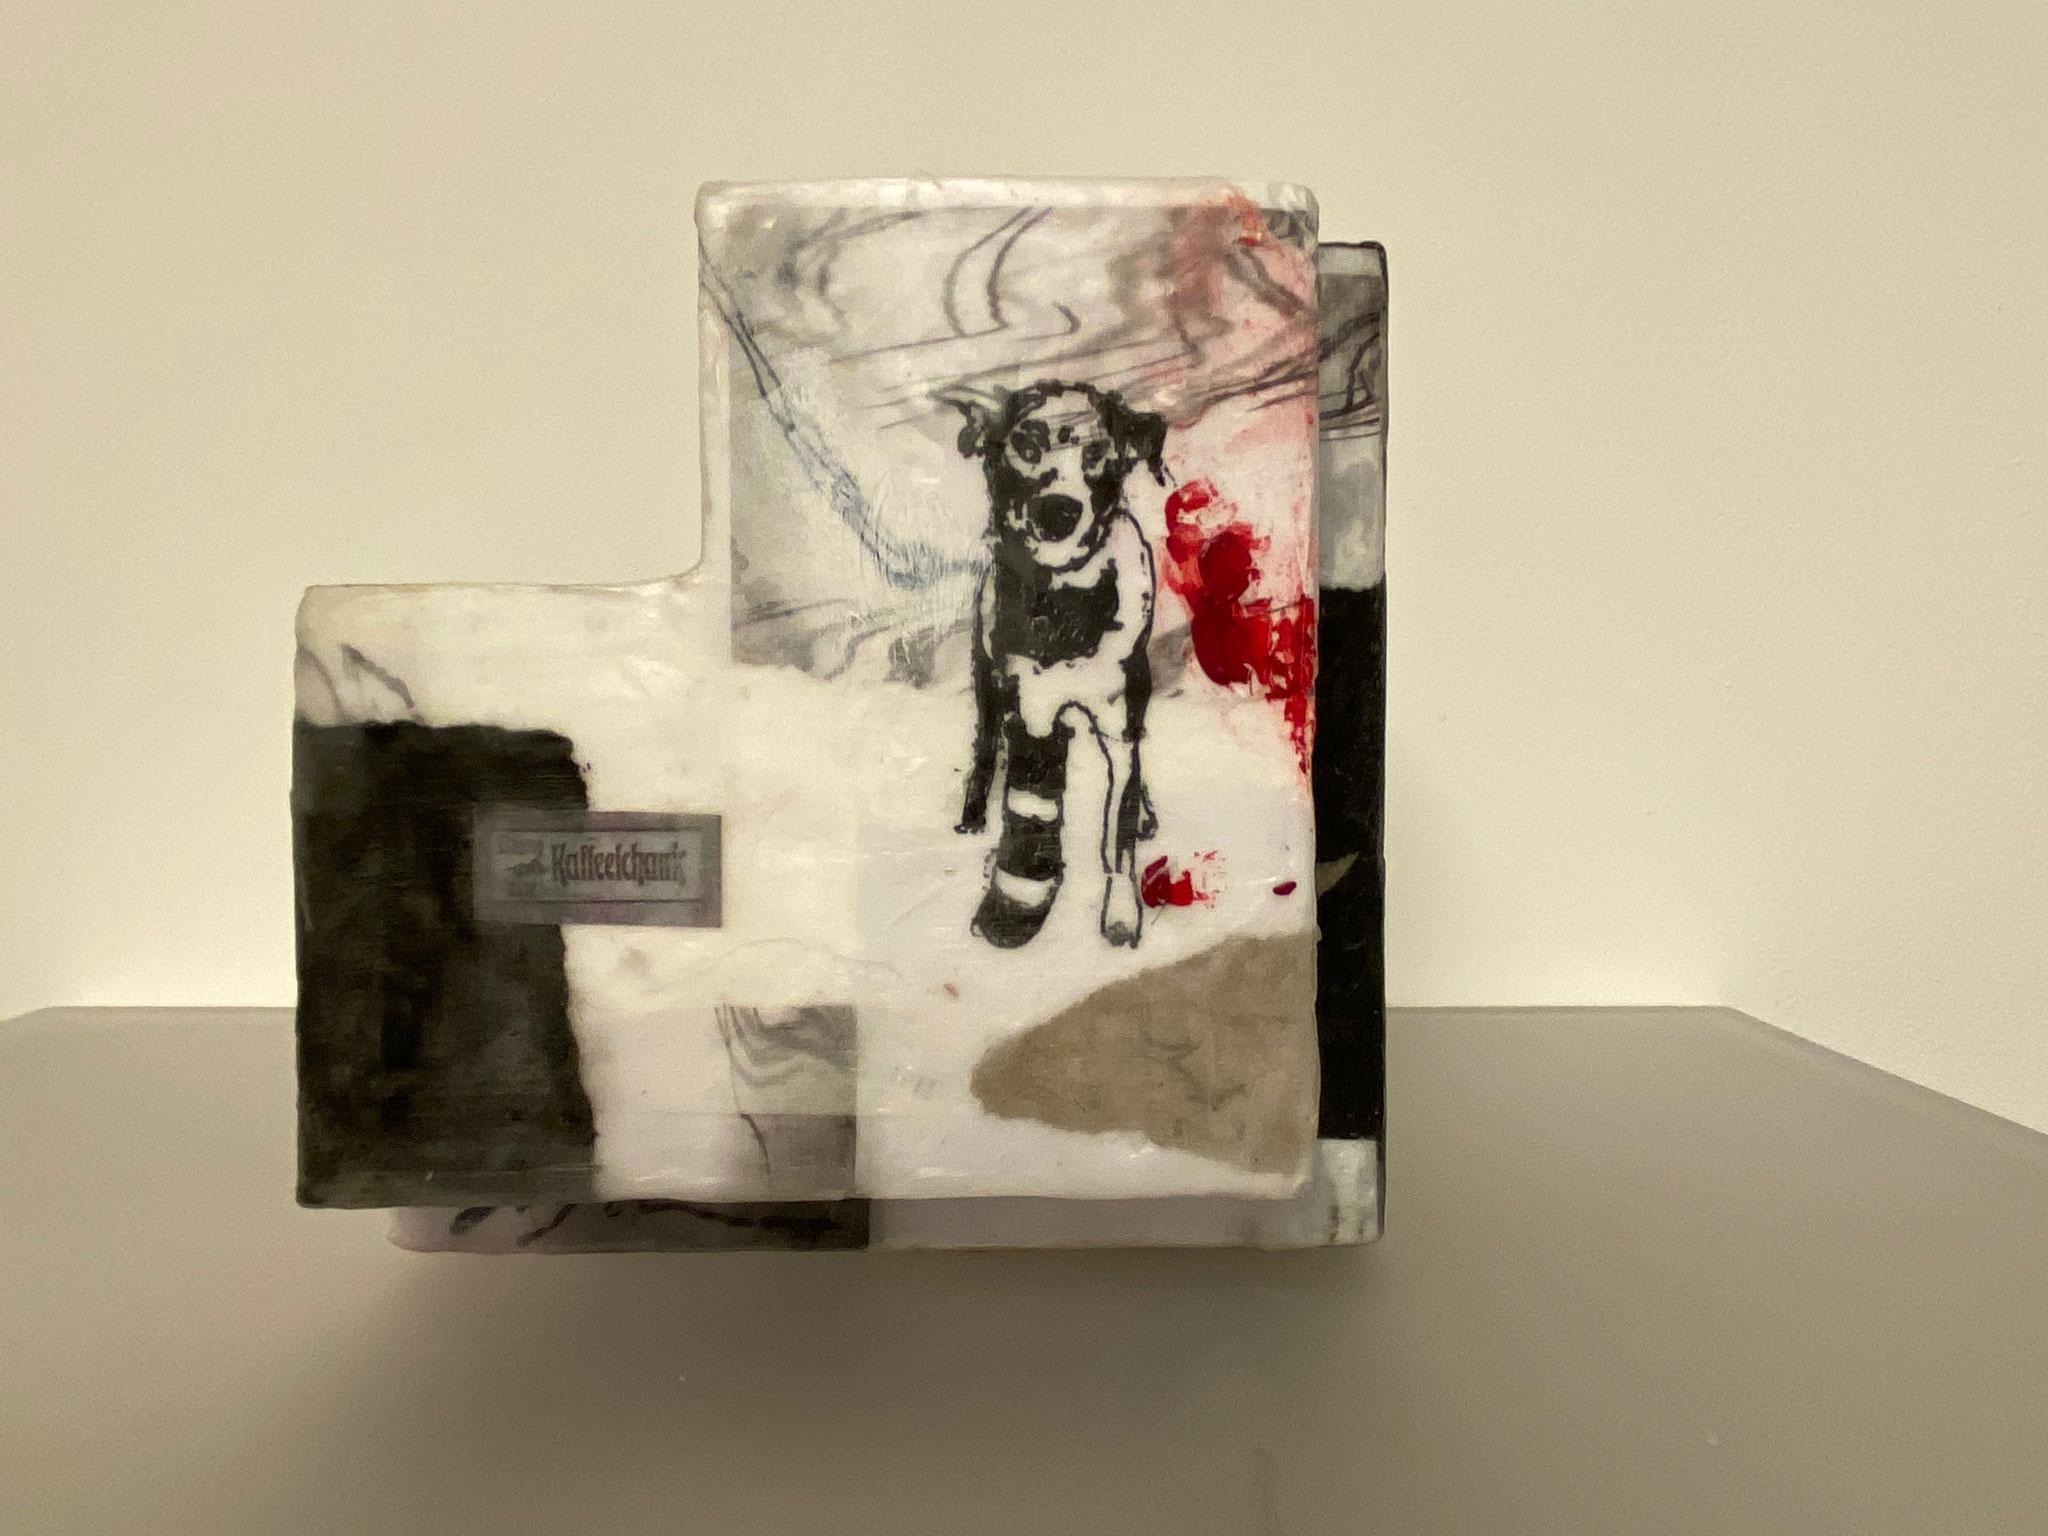 Hund, Objekt mit Wachsfinish, 16x16x13cm